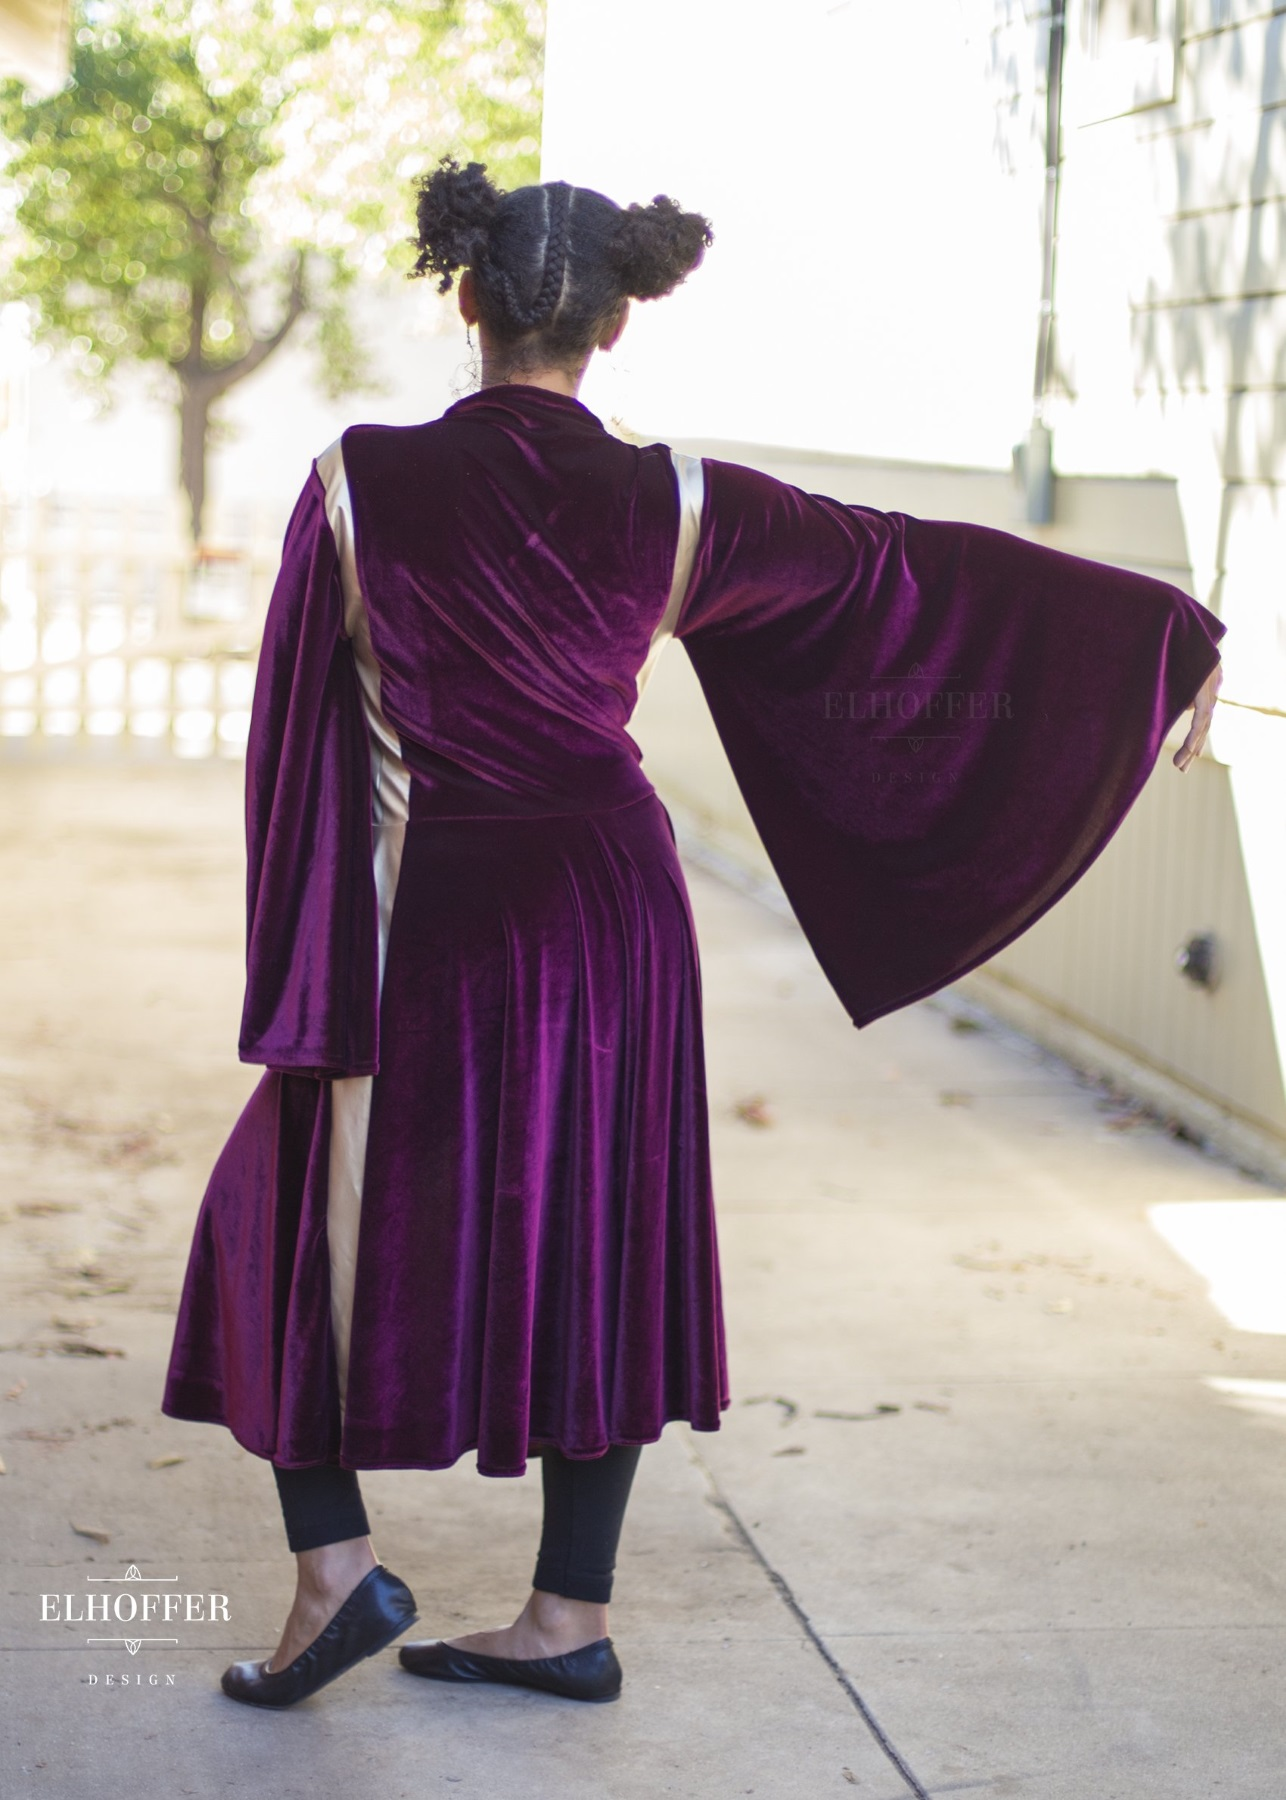 Star Wars Queen Amidala Costume Inspired Galactic Battle Queen Tunic by Elhoffer Design